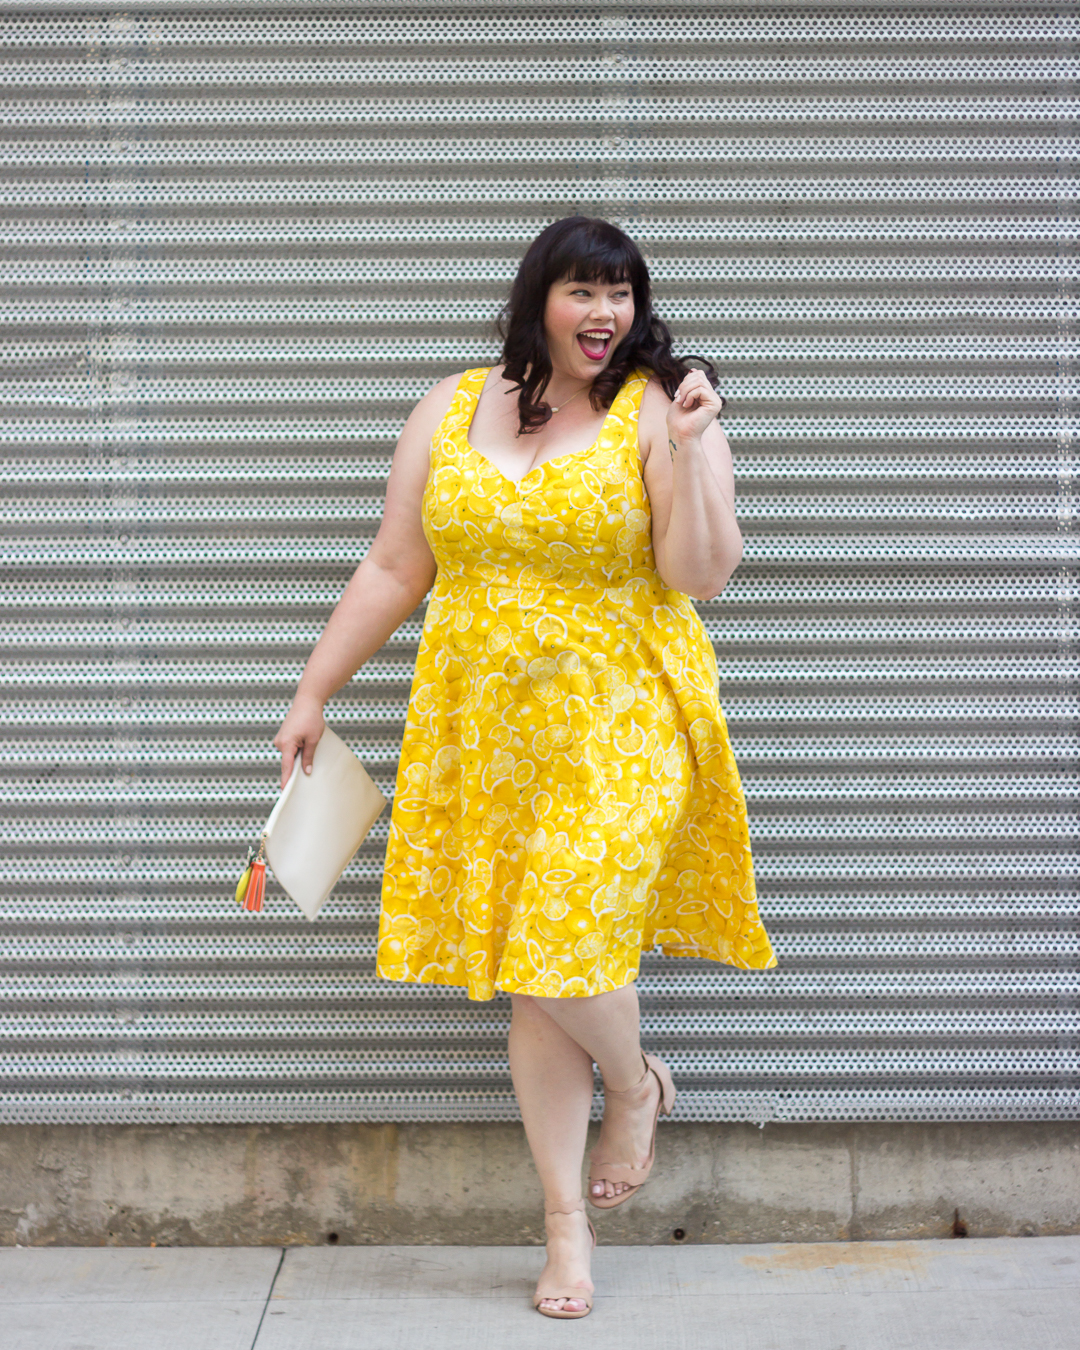 Chicago Style, Gwynnie Bee, Chicago Blogger, Plus Size Blogger, Plus Size Clothing, Lemon Dress, Retro Style, Cherry Velvet